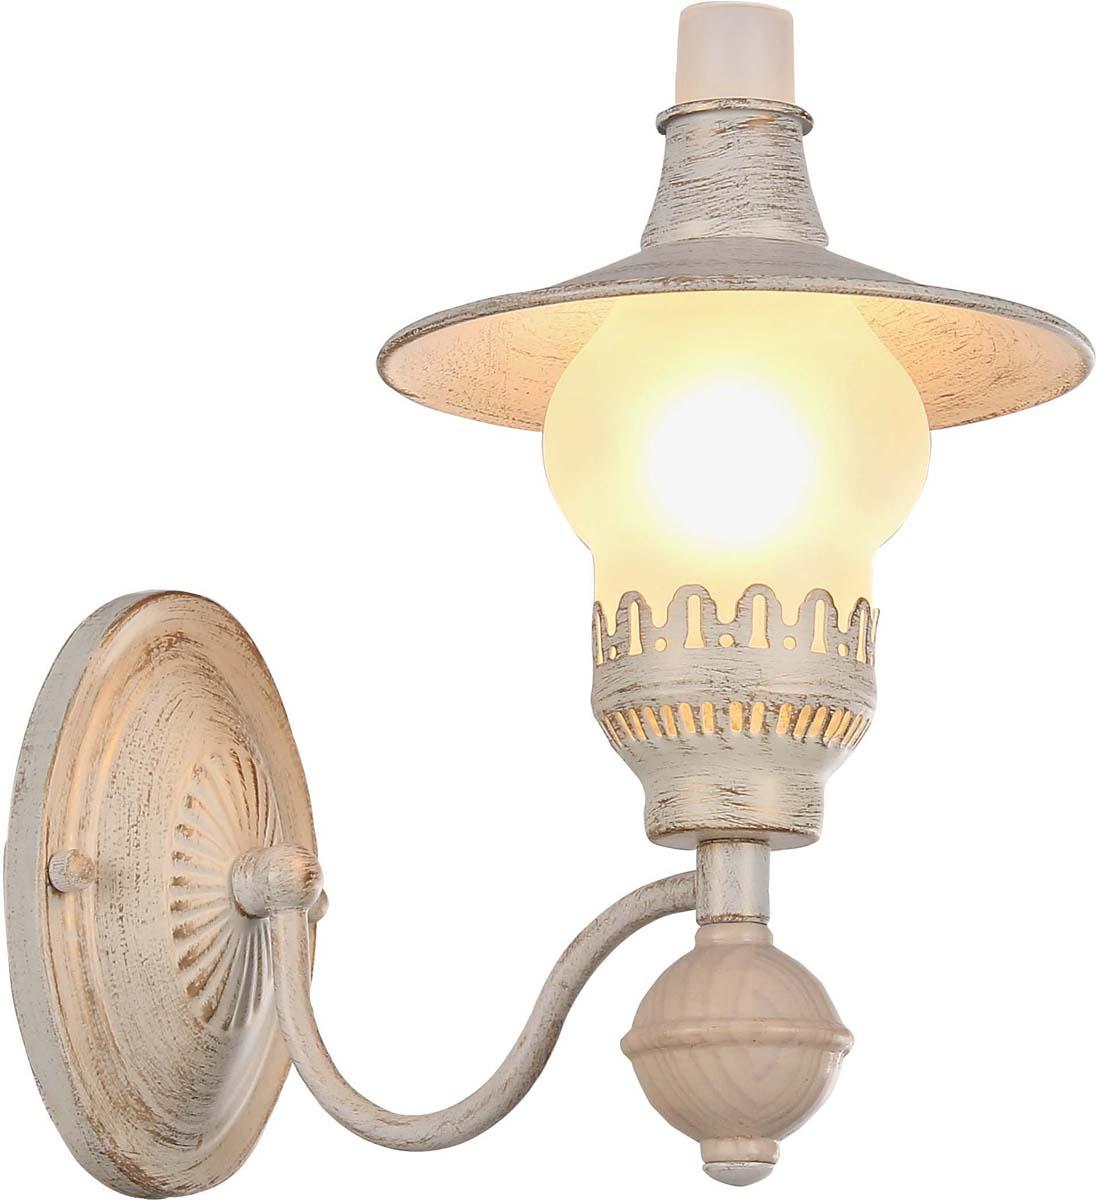 Бра Arte Lamp Trattoria, цвет: белый, золотой, 1 х E14, 60 W. A5664AP-1WGA5664AP-1WG